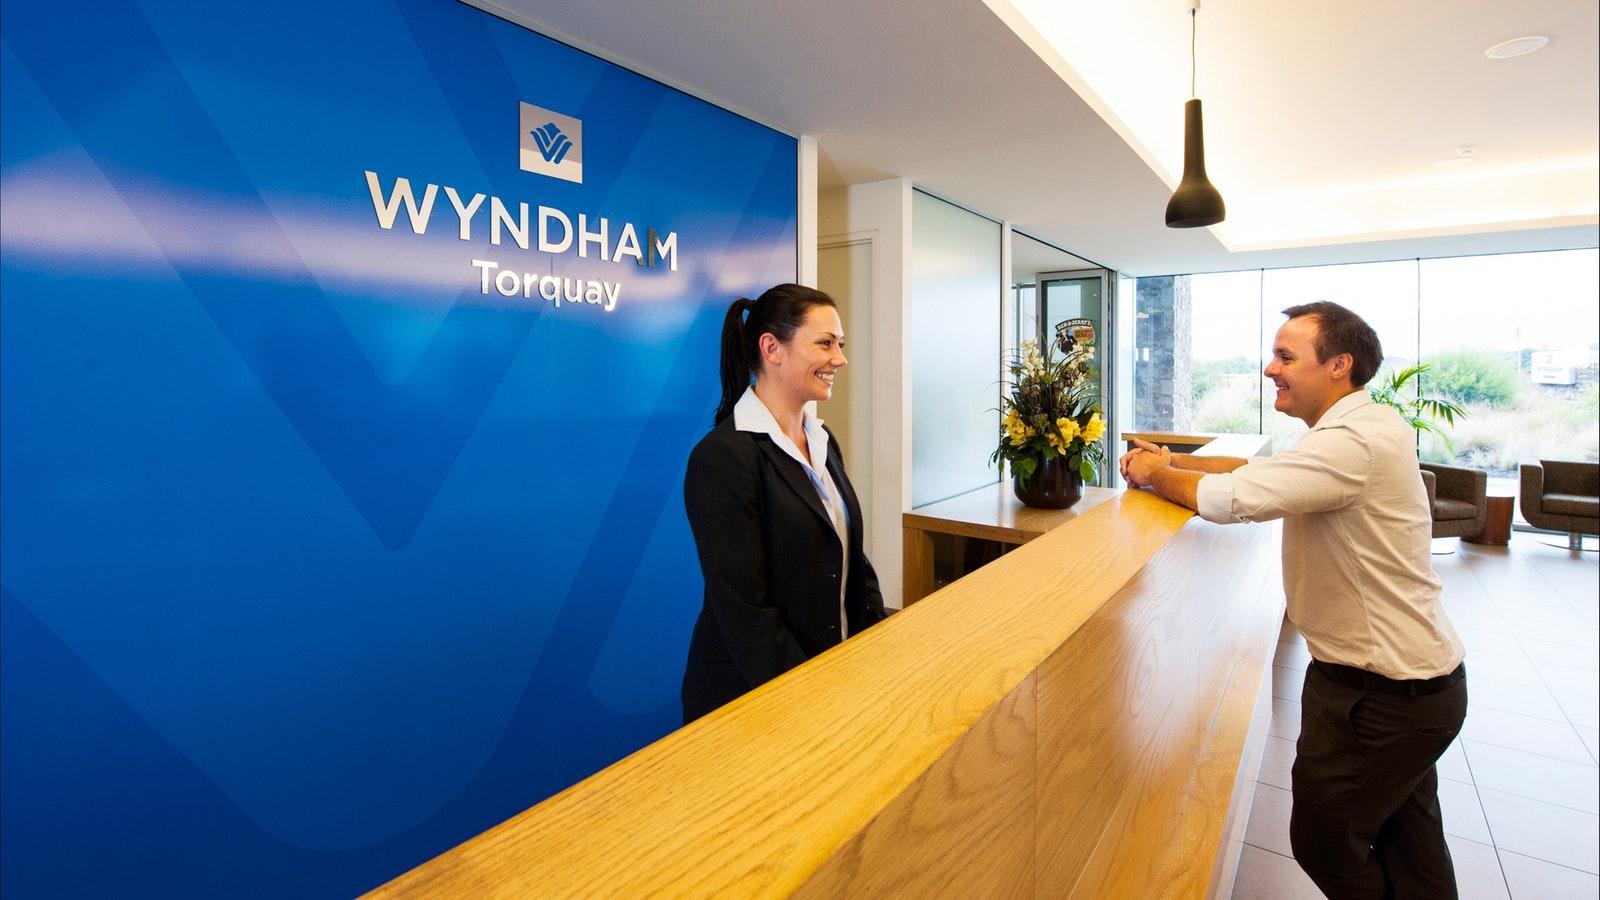 Wyndham Resort Torquay reception